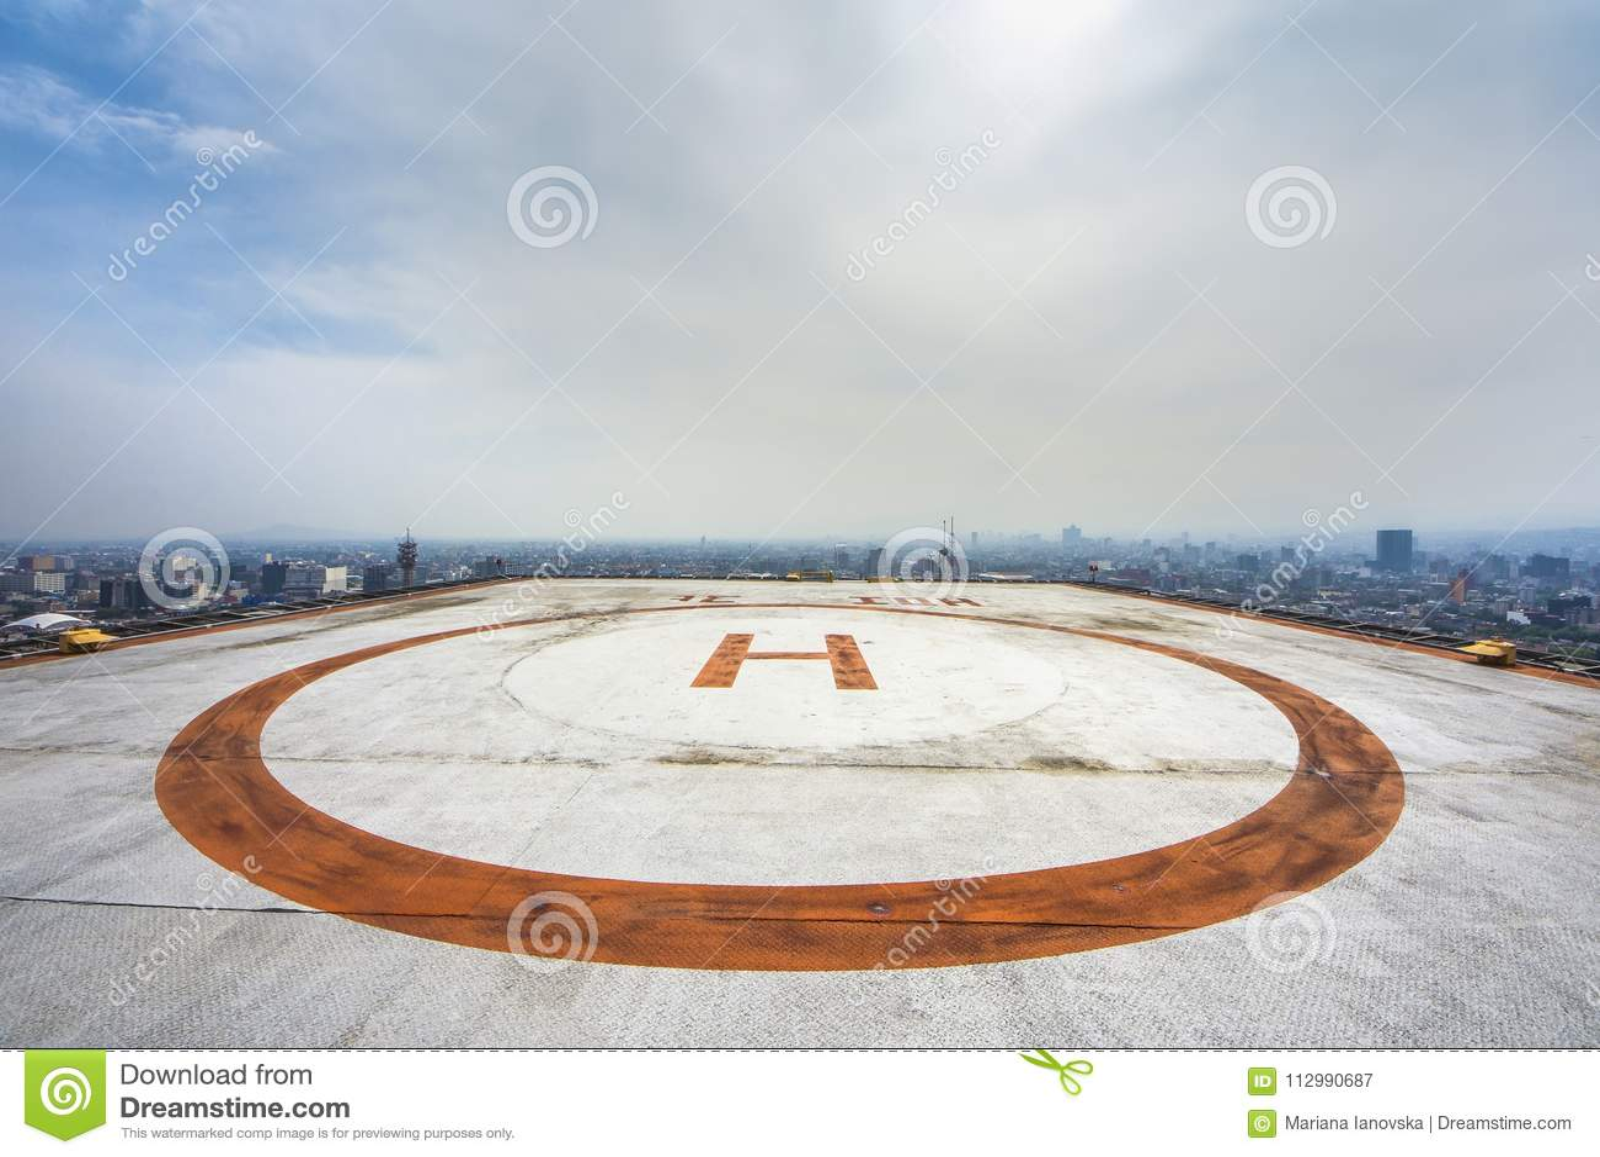 Helipad on roof top building